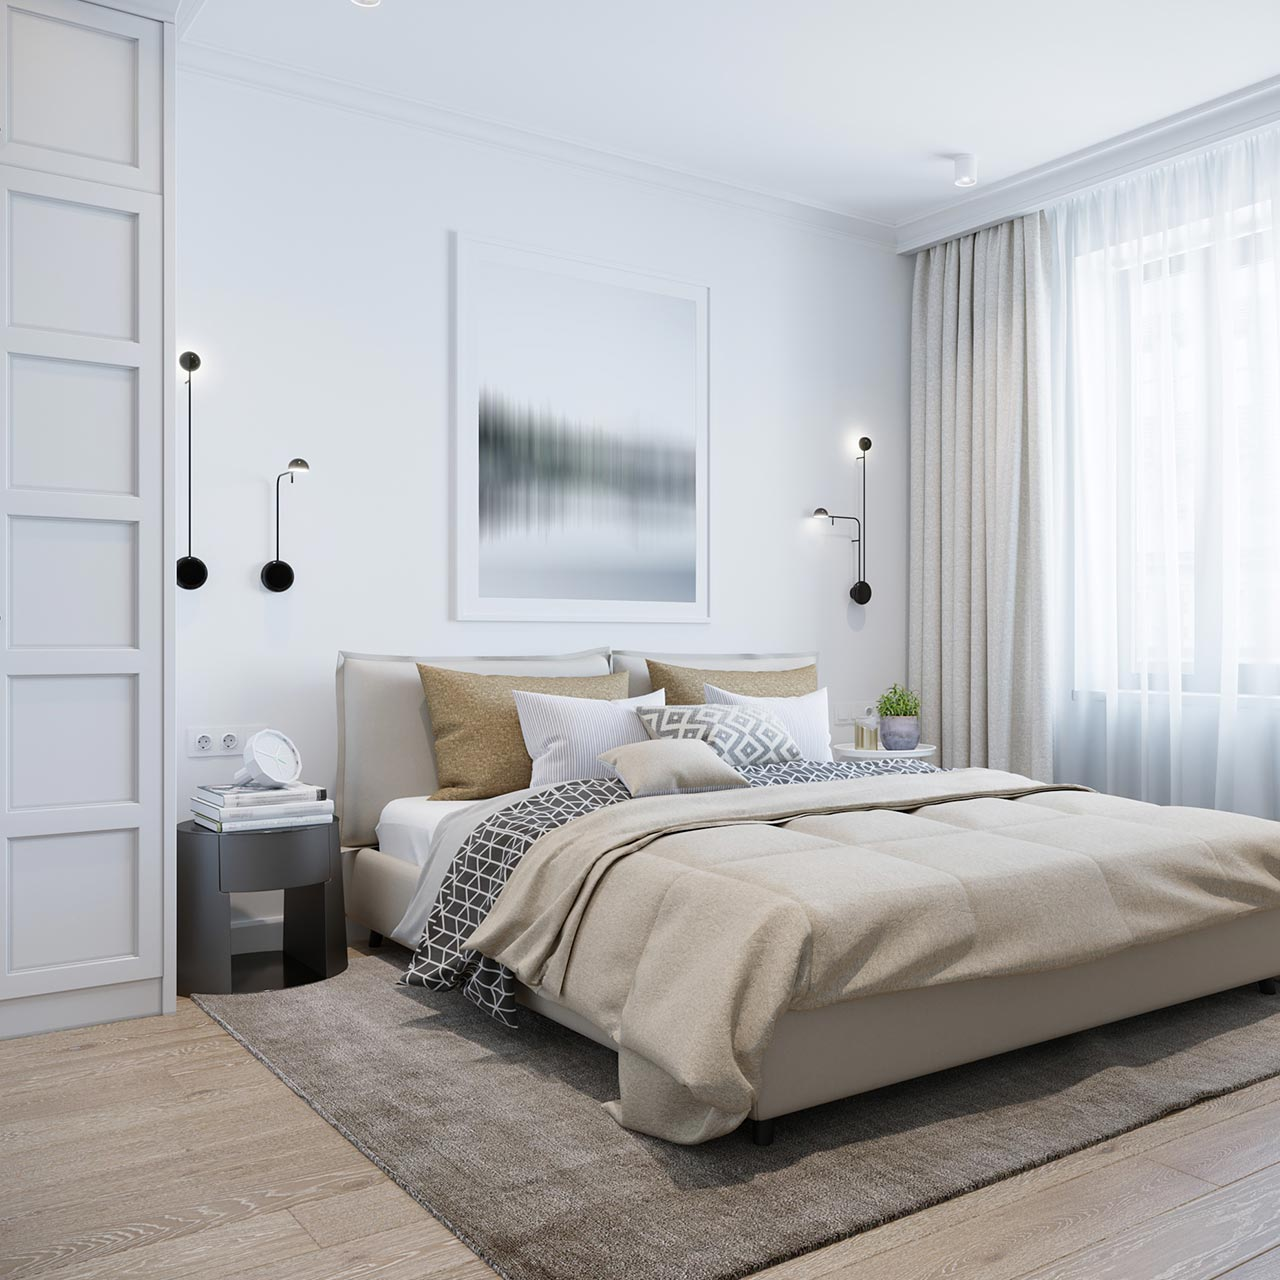 Walls Arts Ideas for Scanadivian Bedroom Design